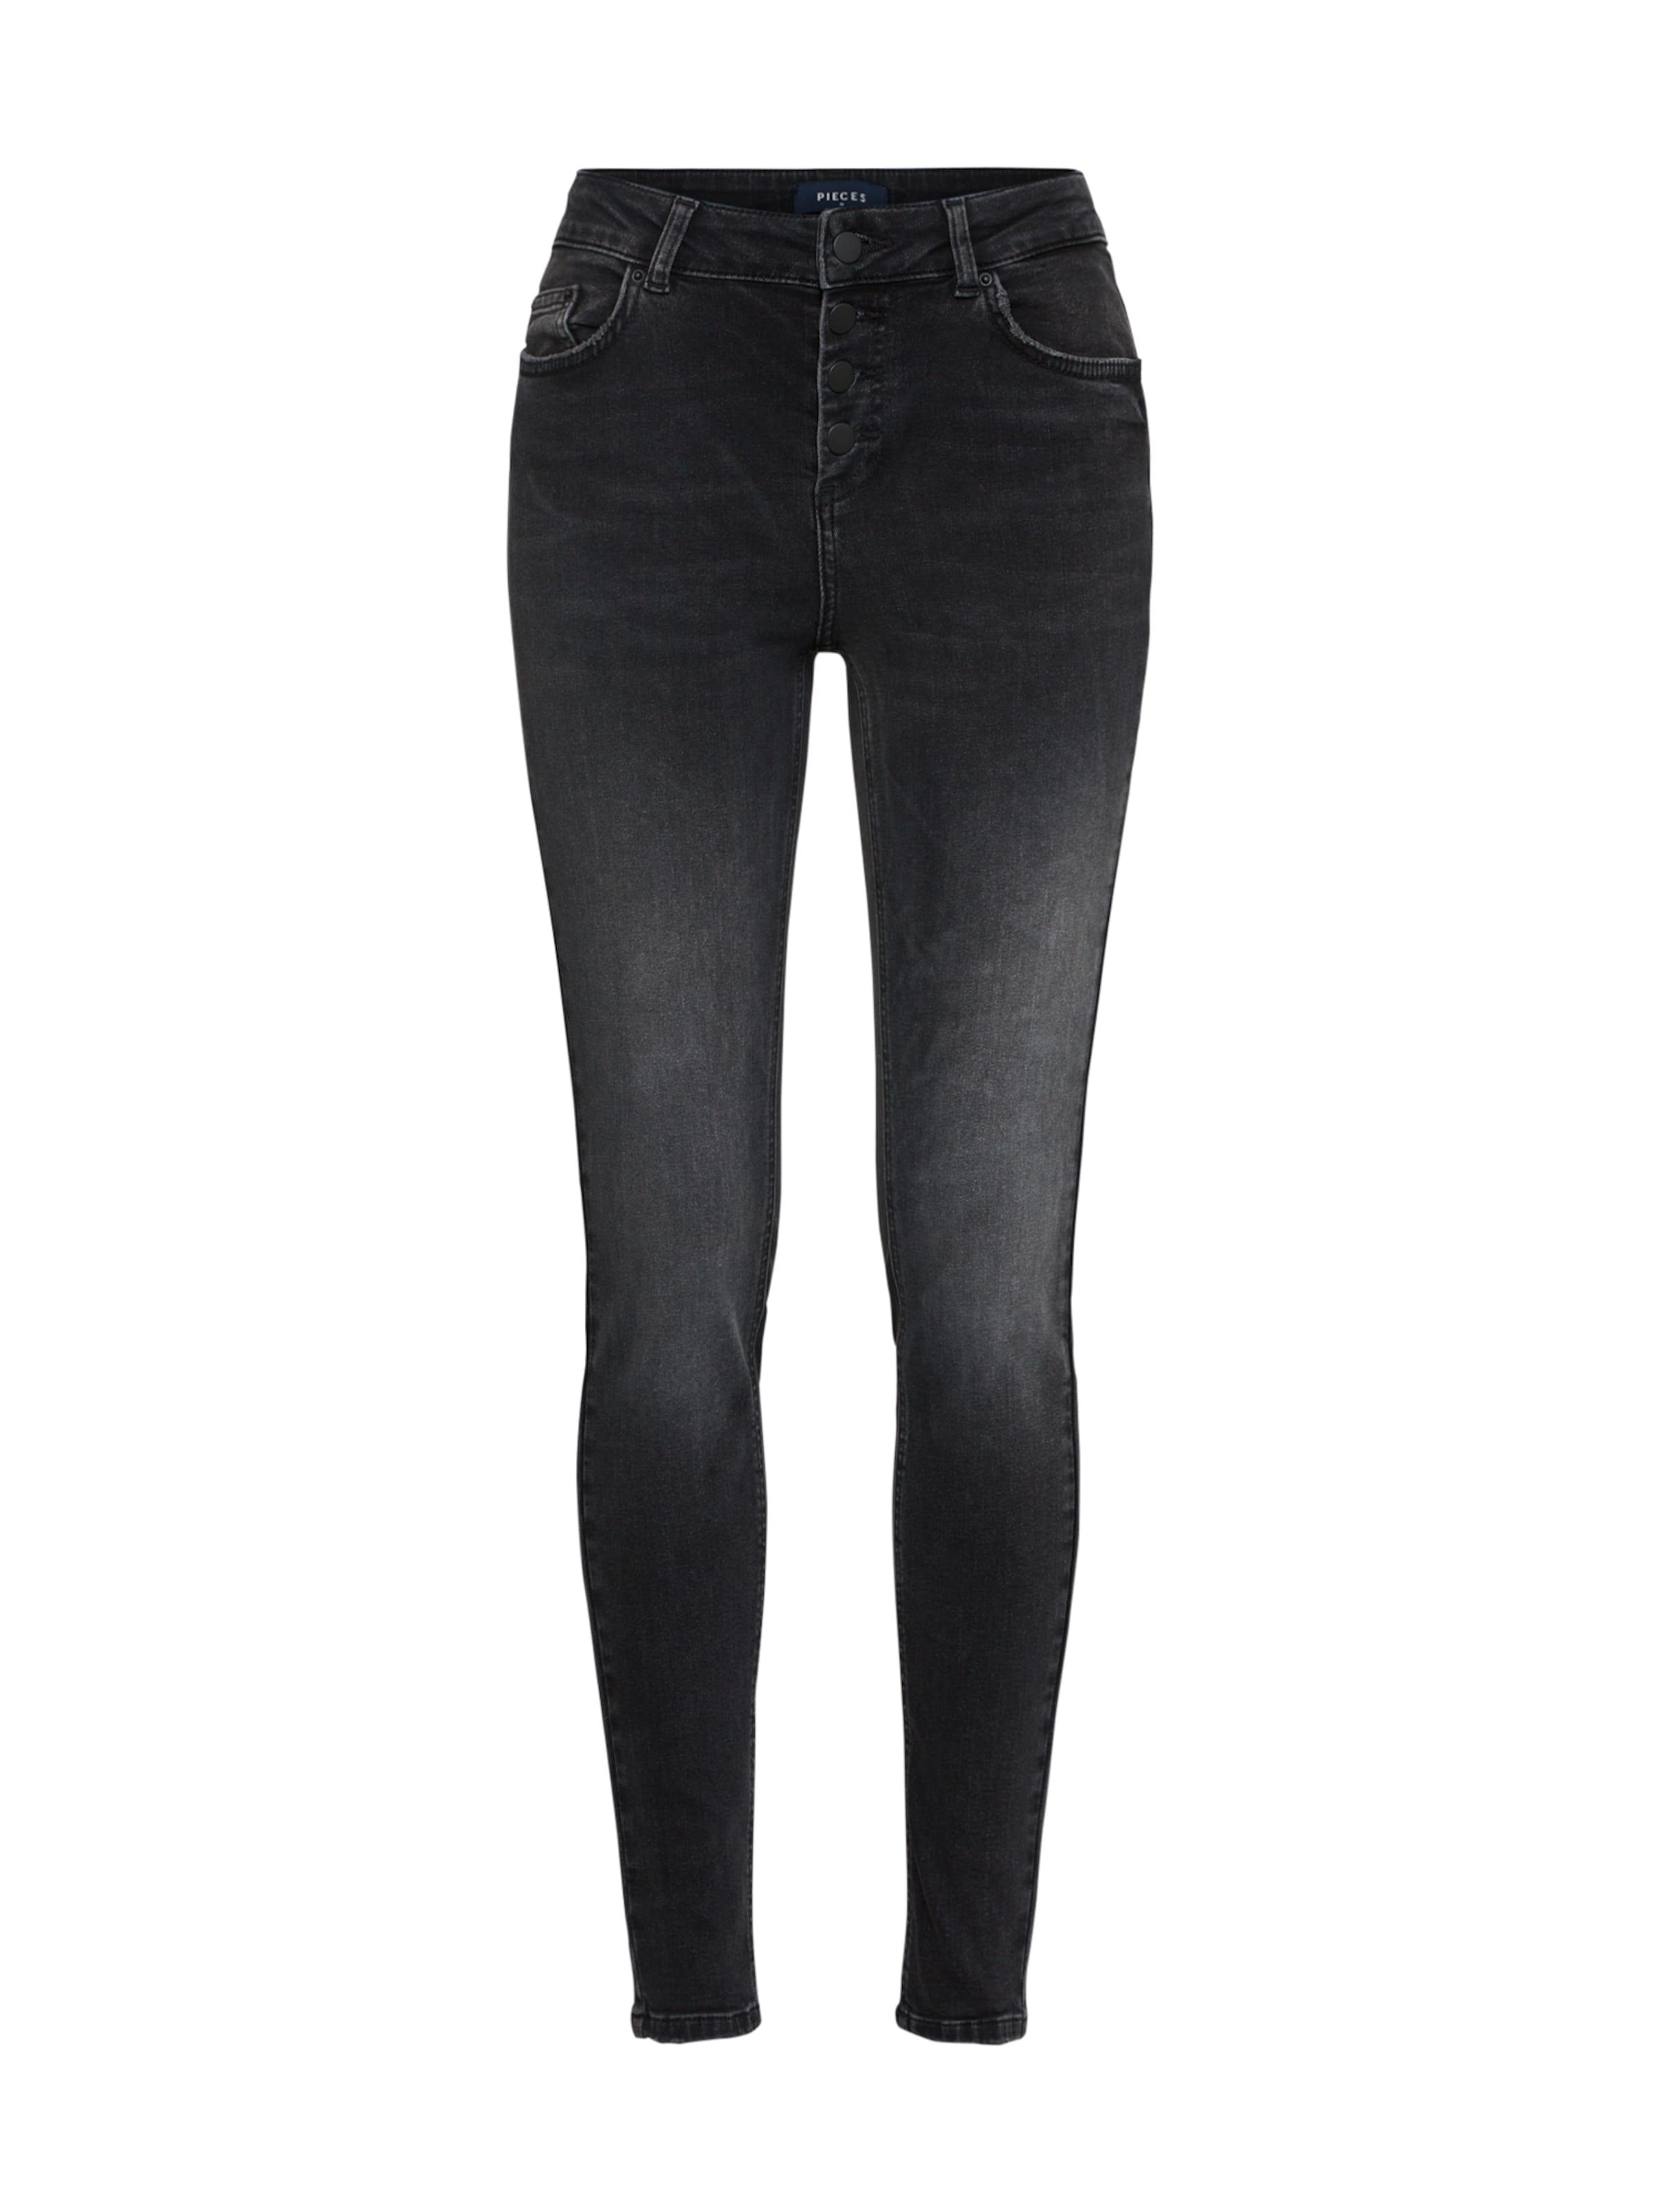 Denim Jeans Pieces Pieces Pieces In In Jeans Black Denim Black In Jeans kn0POw